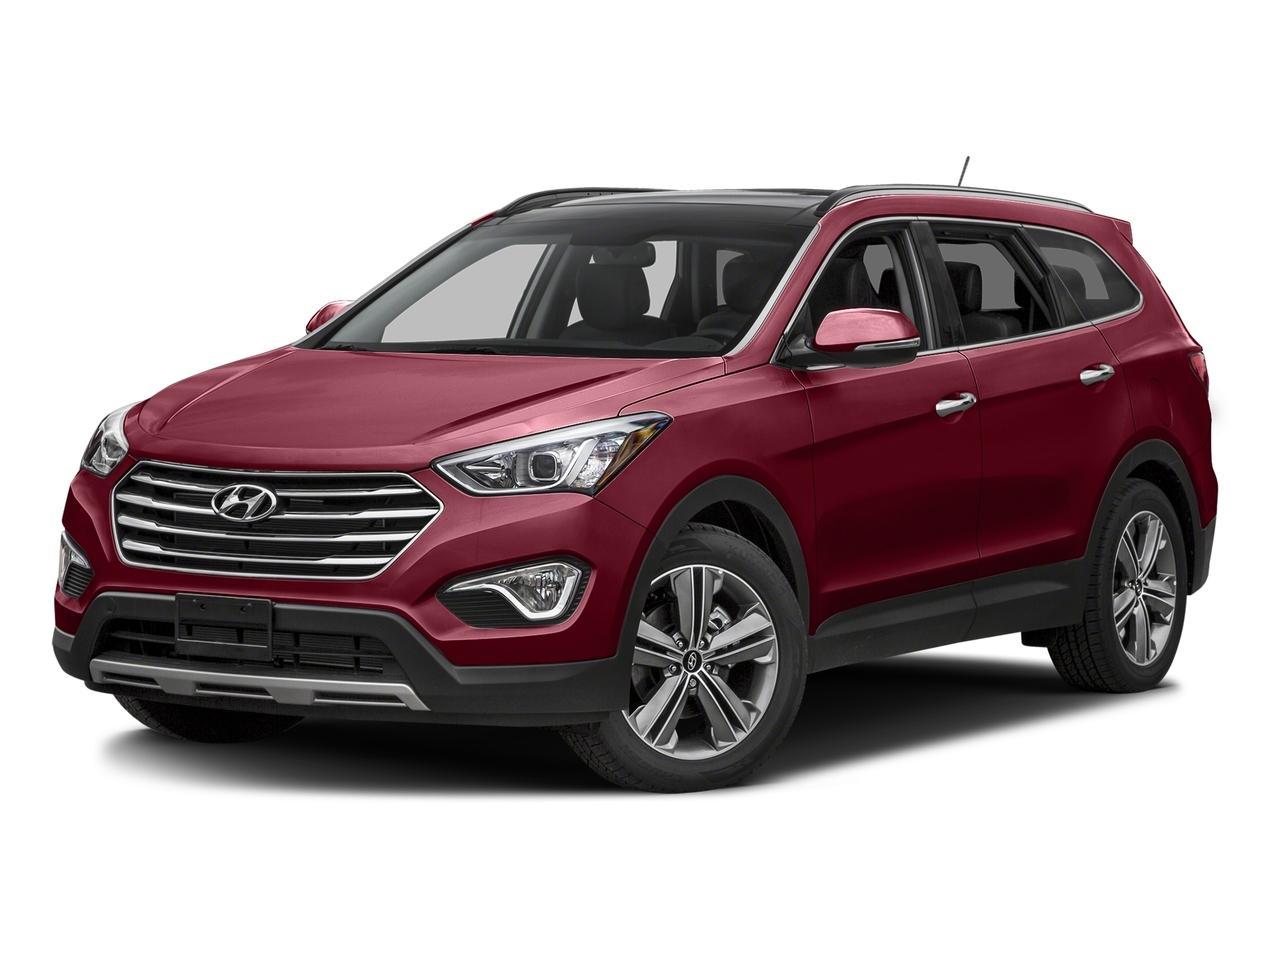 2016 Hyundai Santa Fe Vehicle Photo in Easton, PA 18045